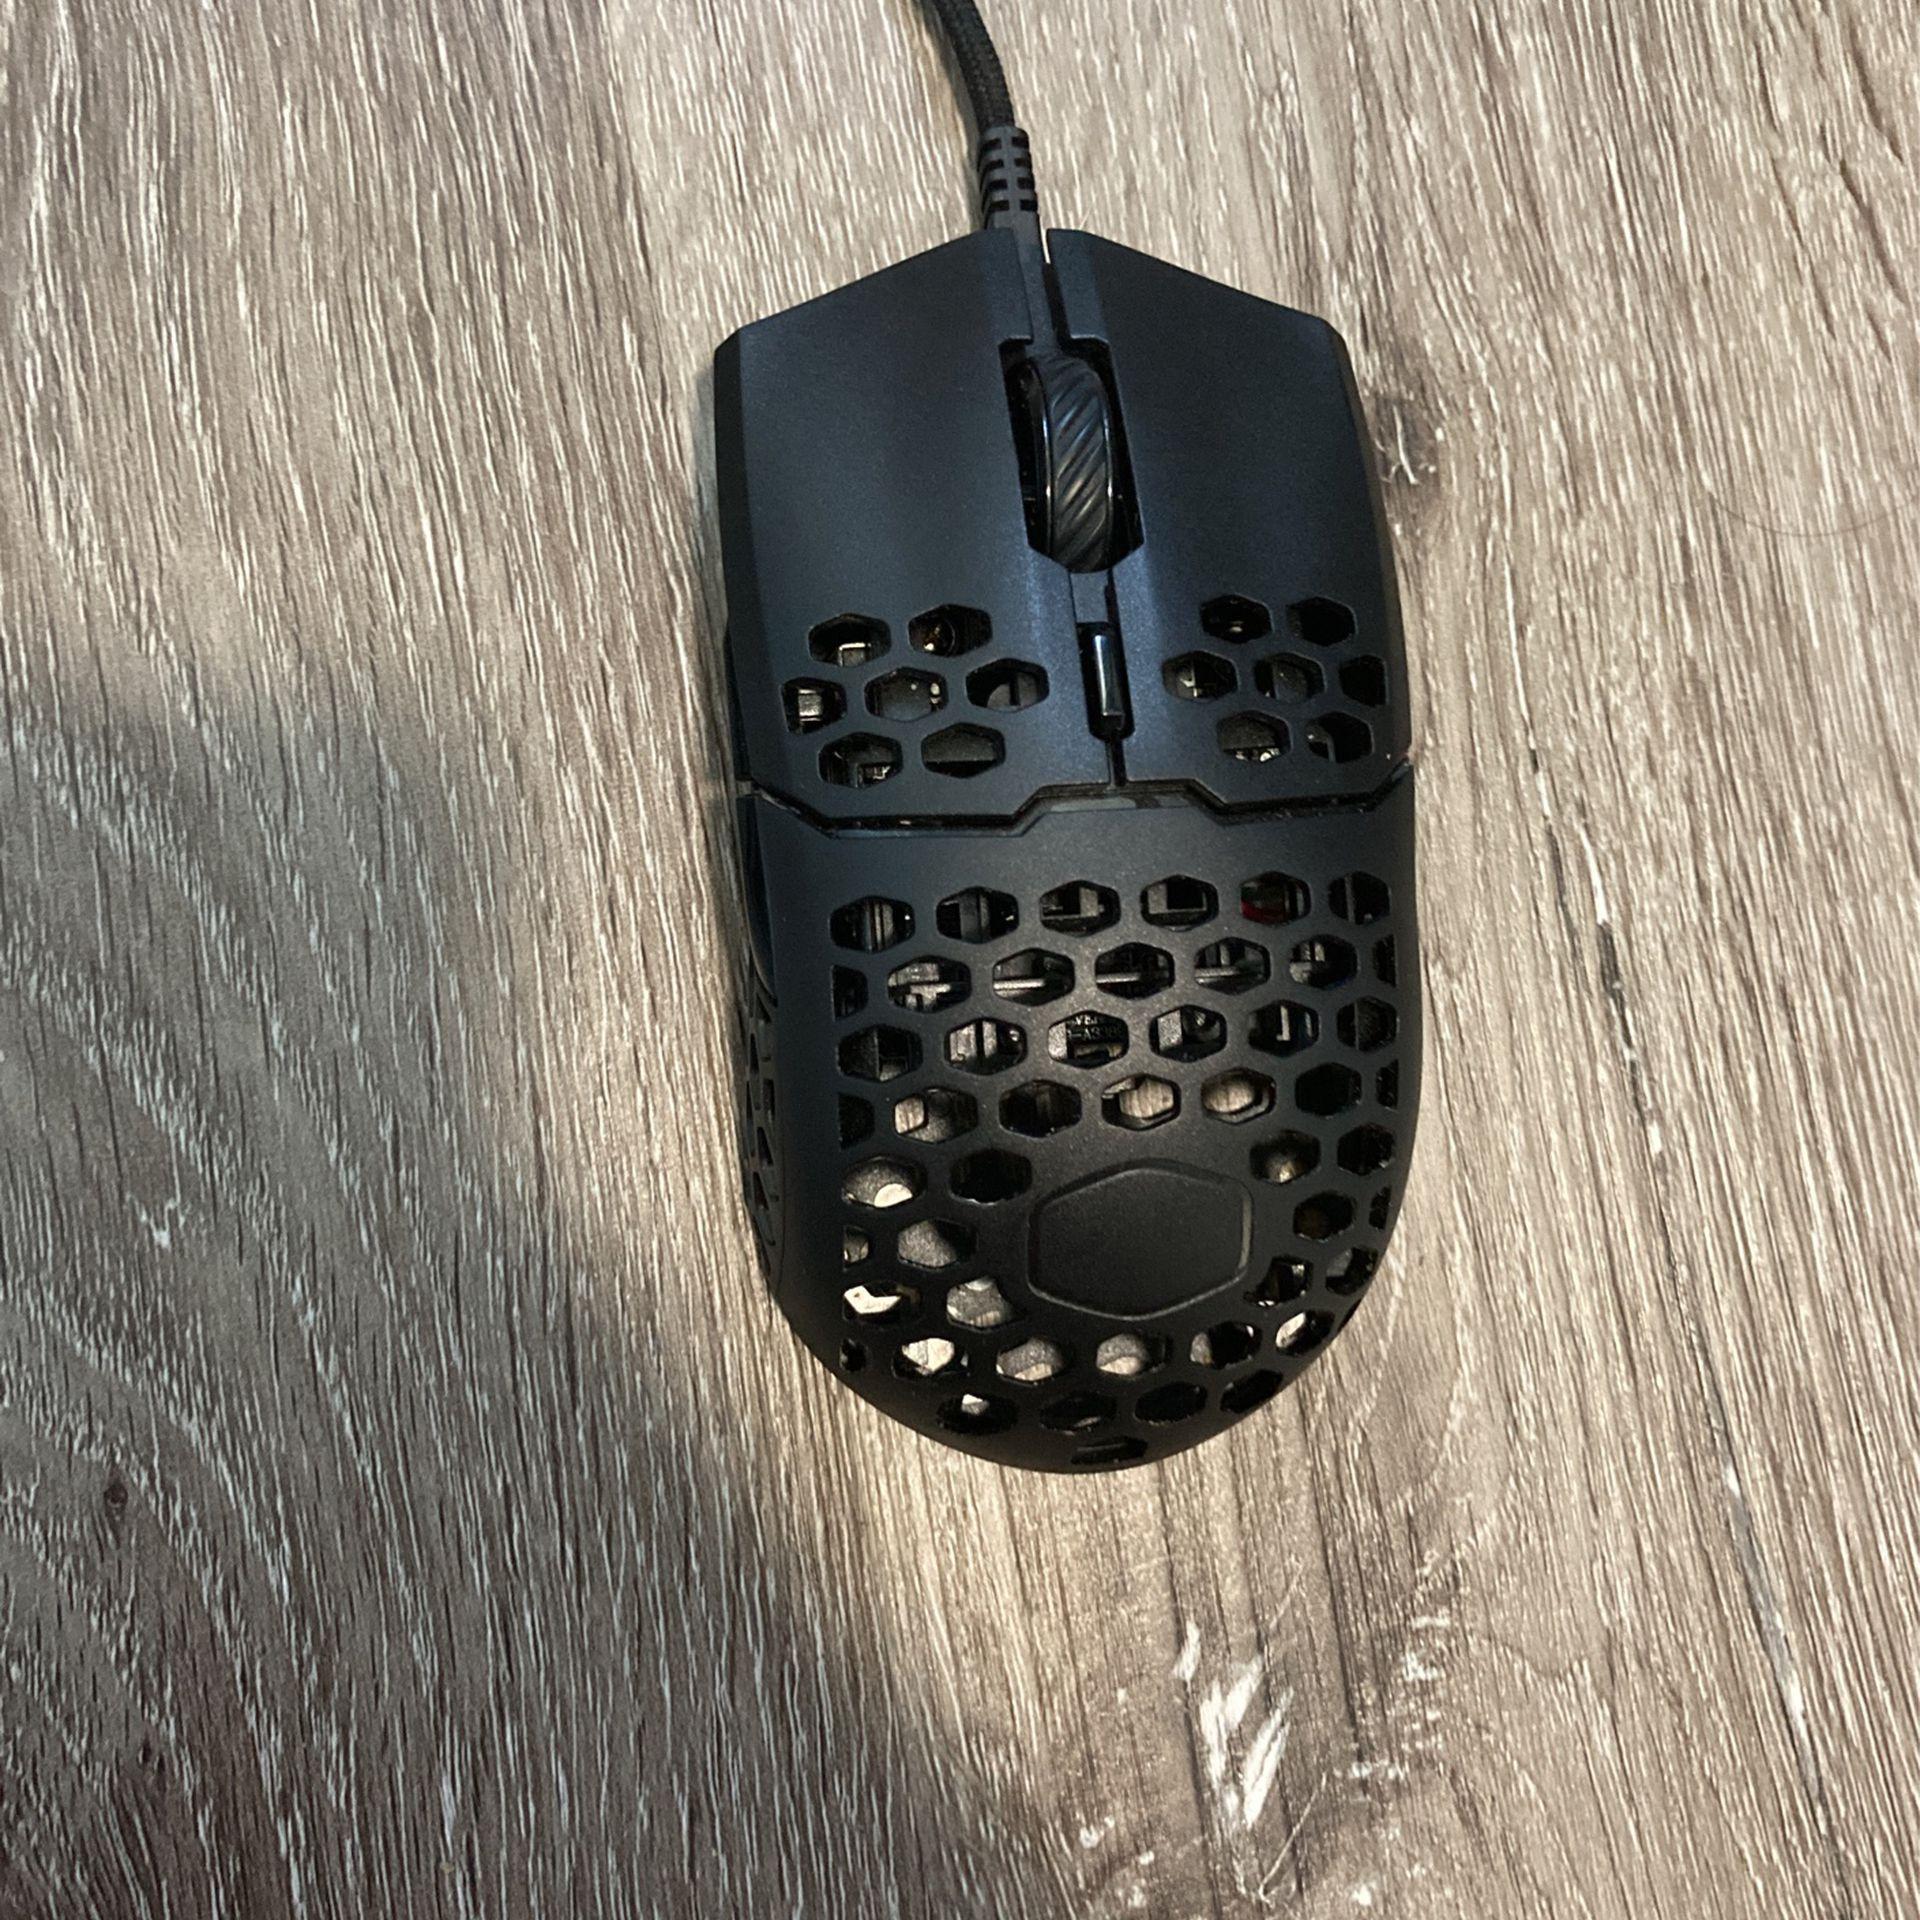 mm710